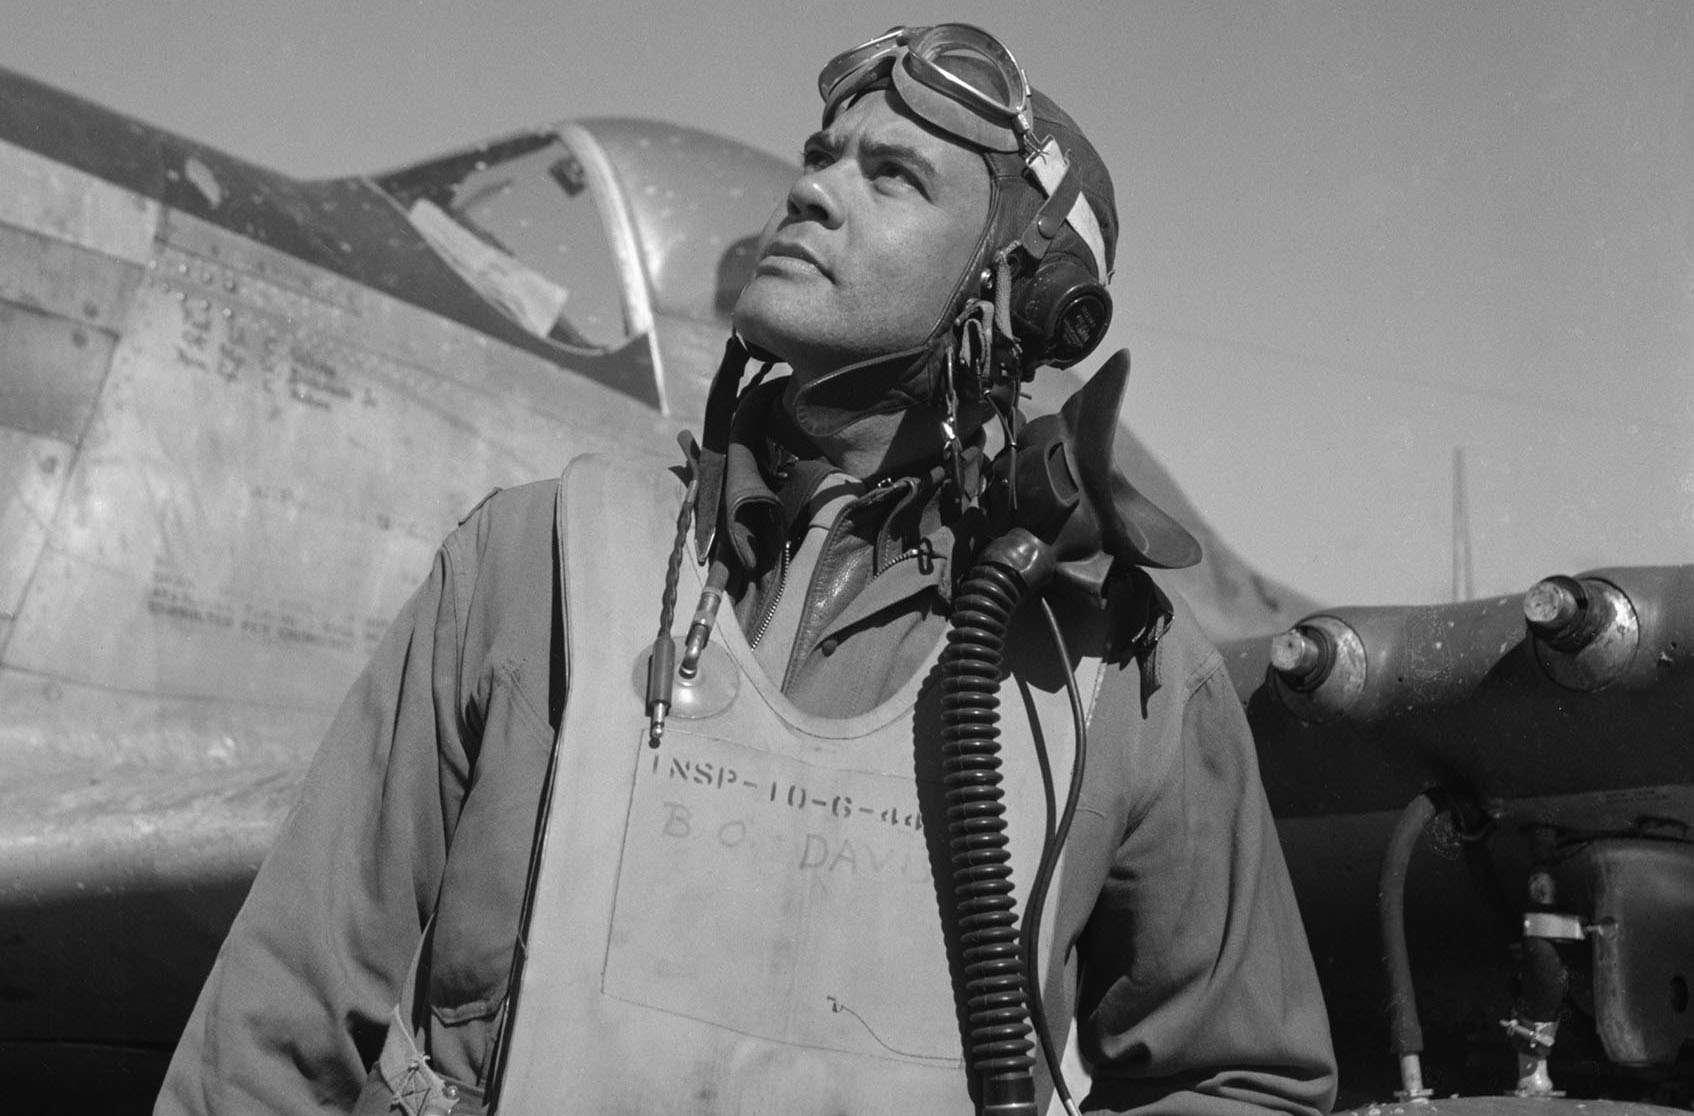 Benjamin O. Davis in a flight suit and helmet standing in front of a P-51 Mustang fighter.